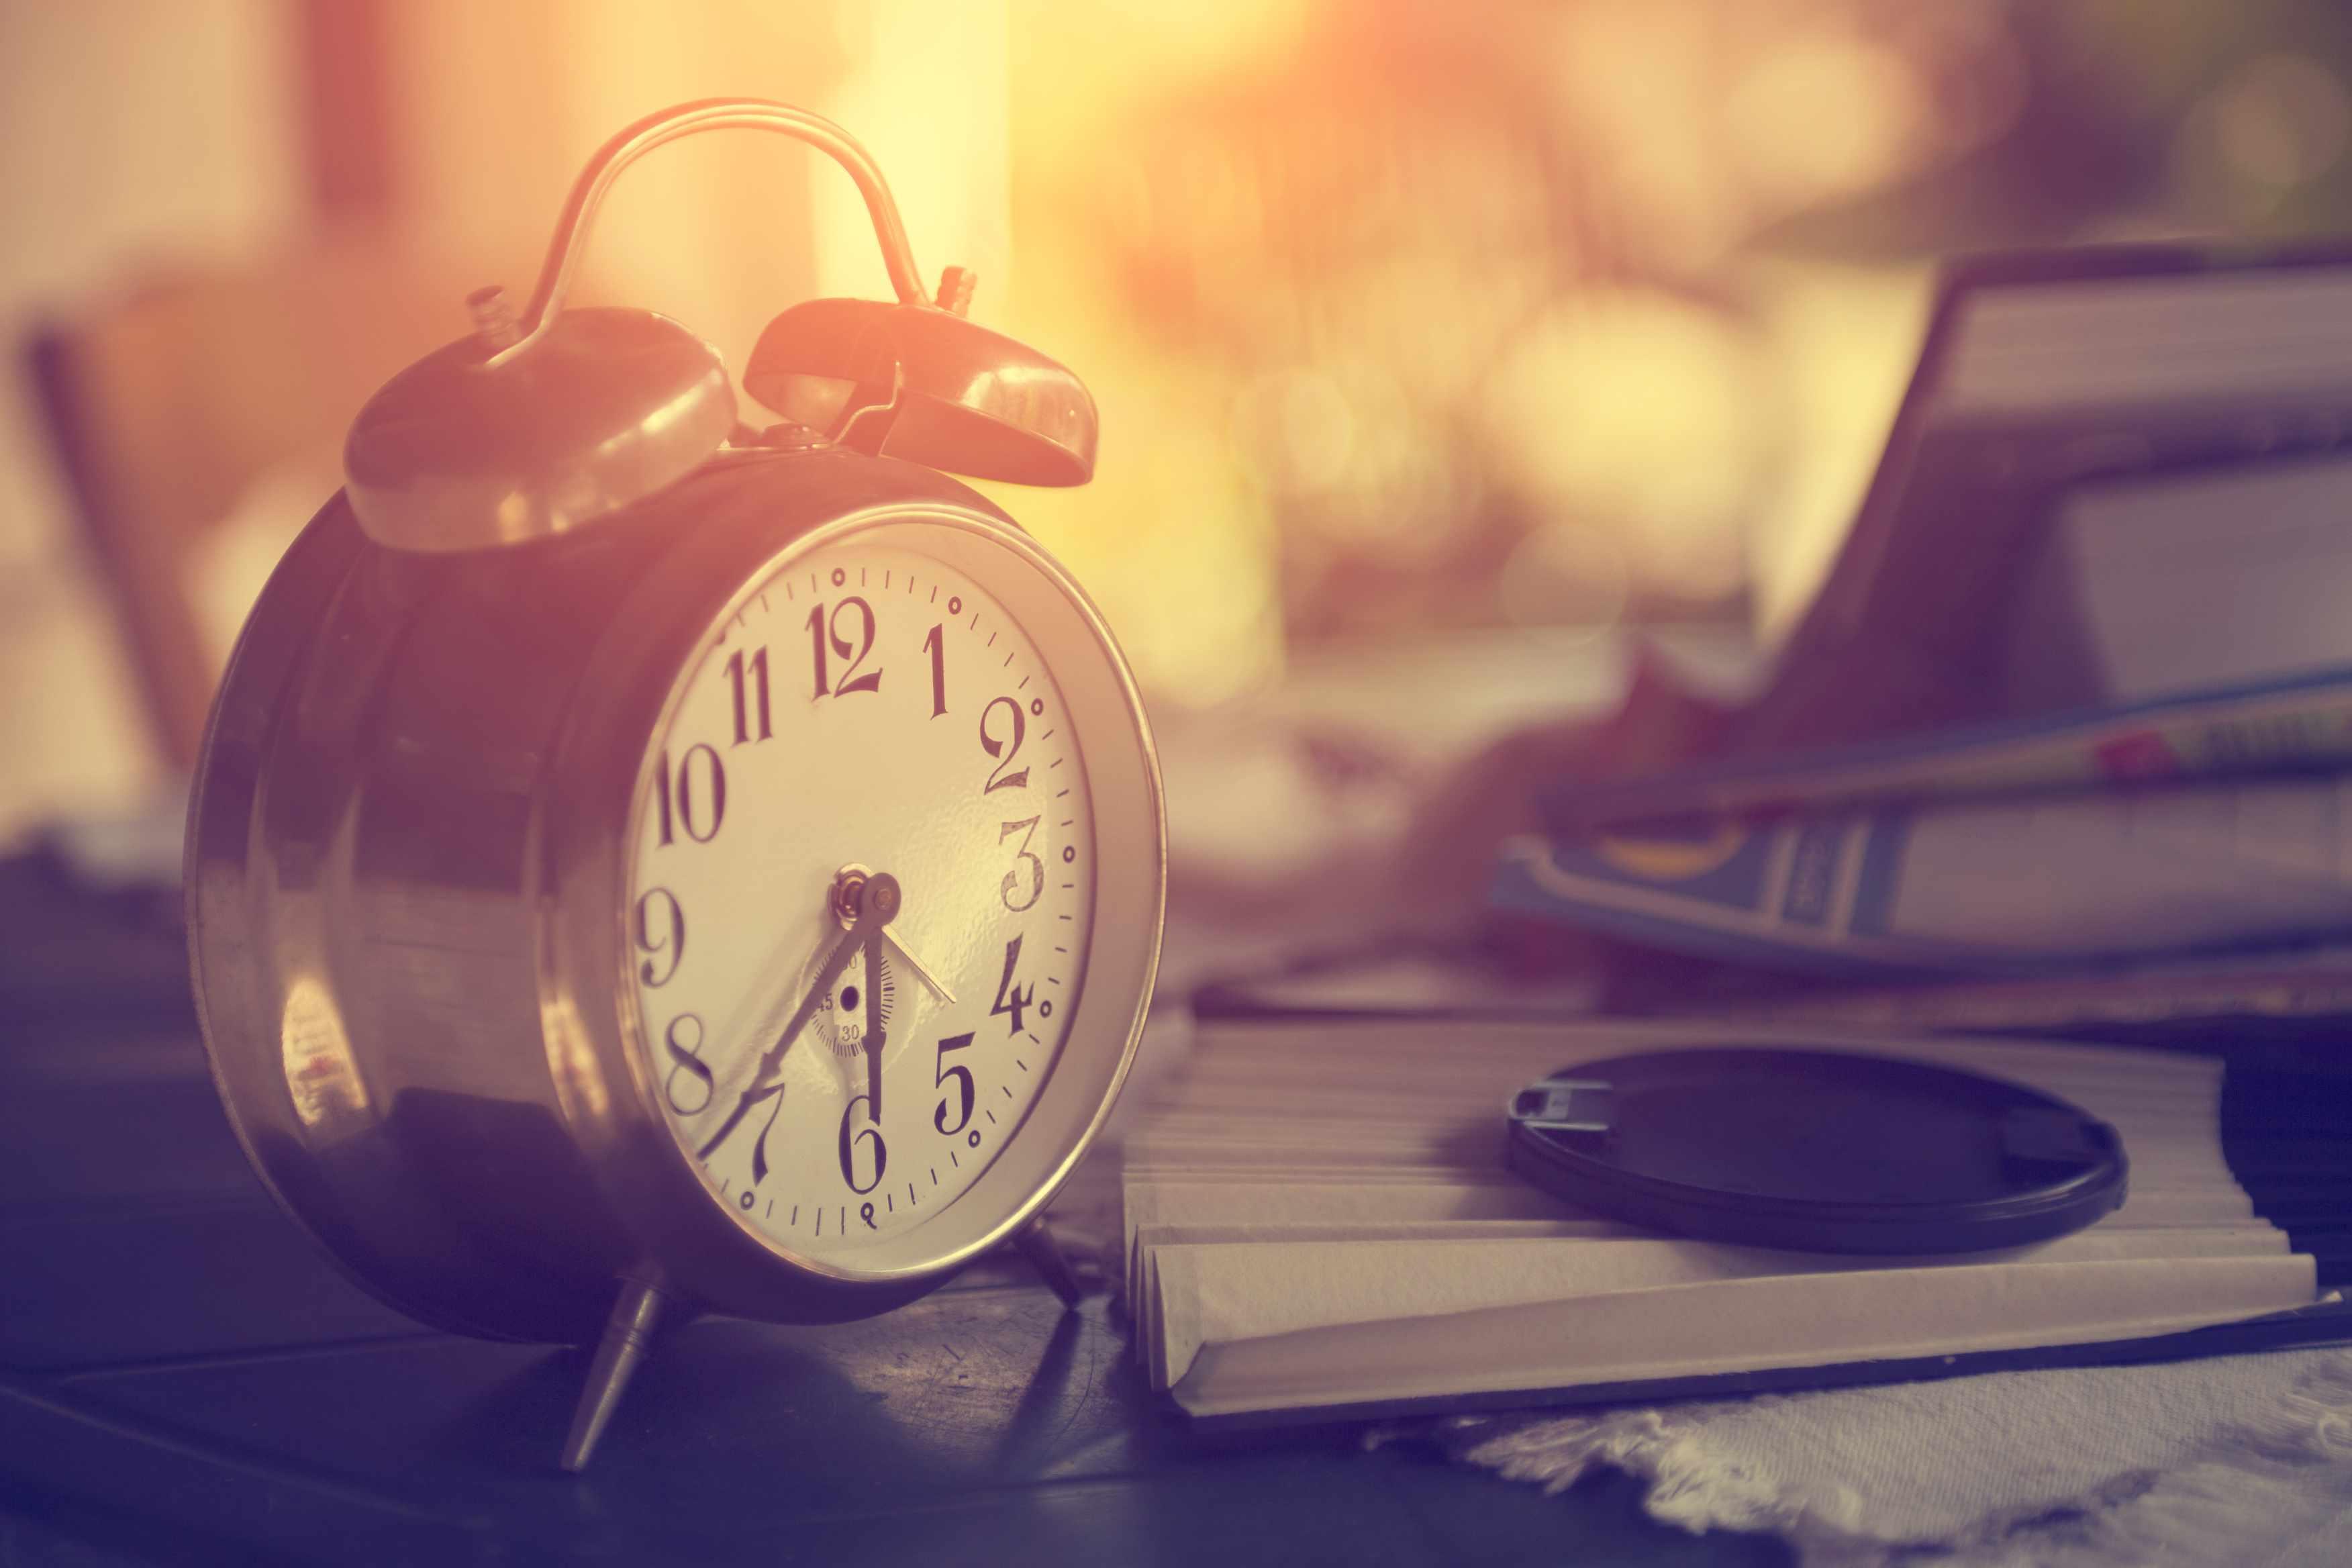 retro alarm clock on table with books